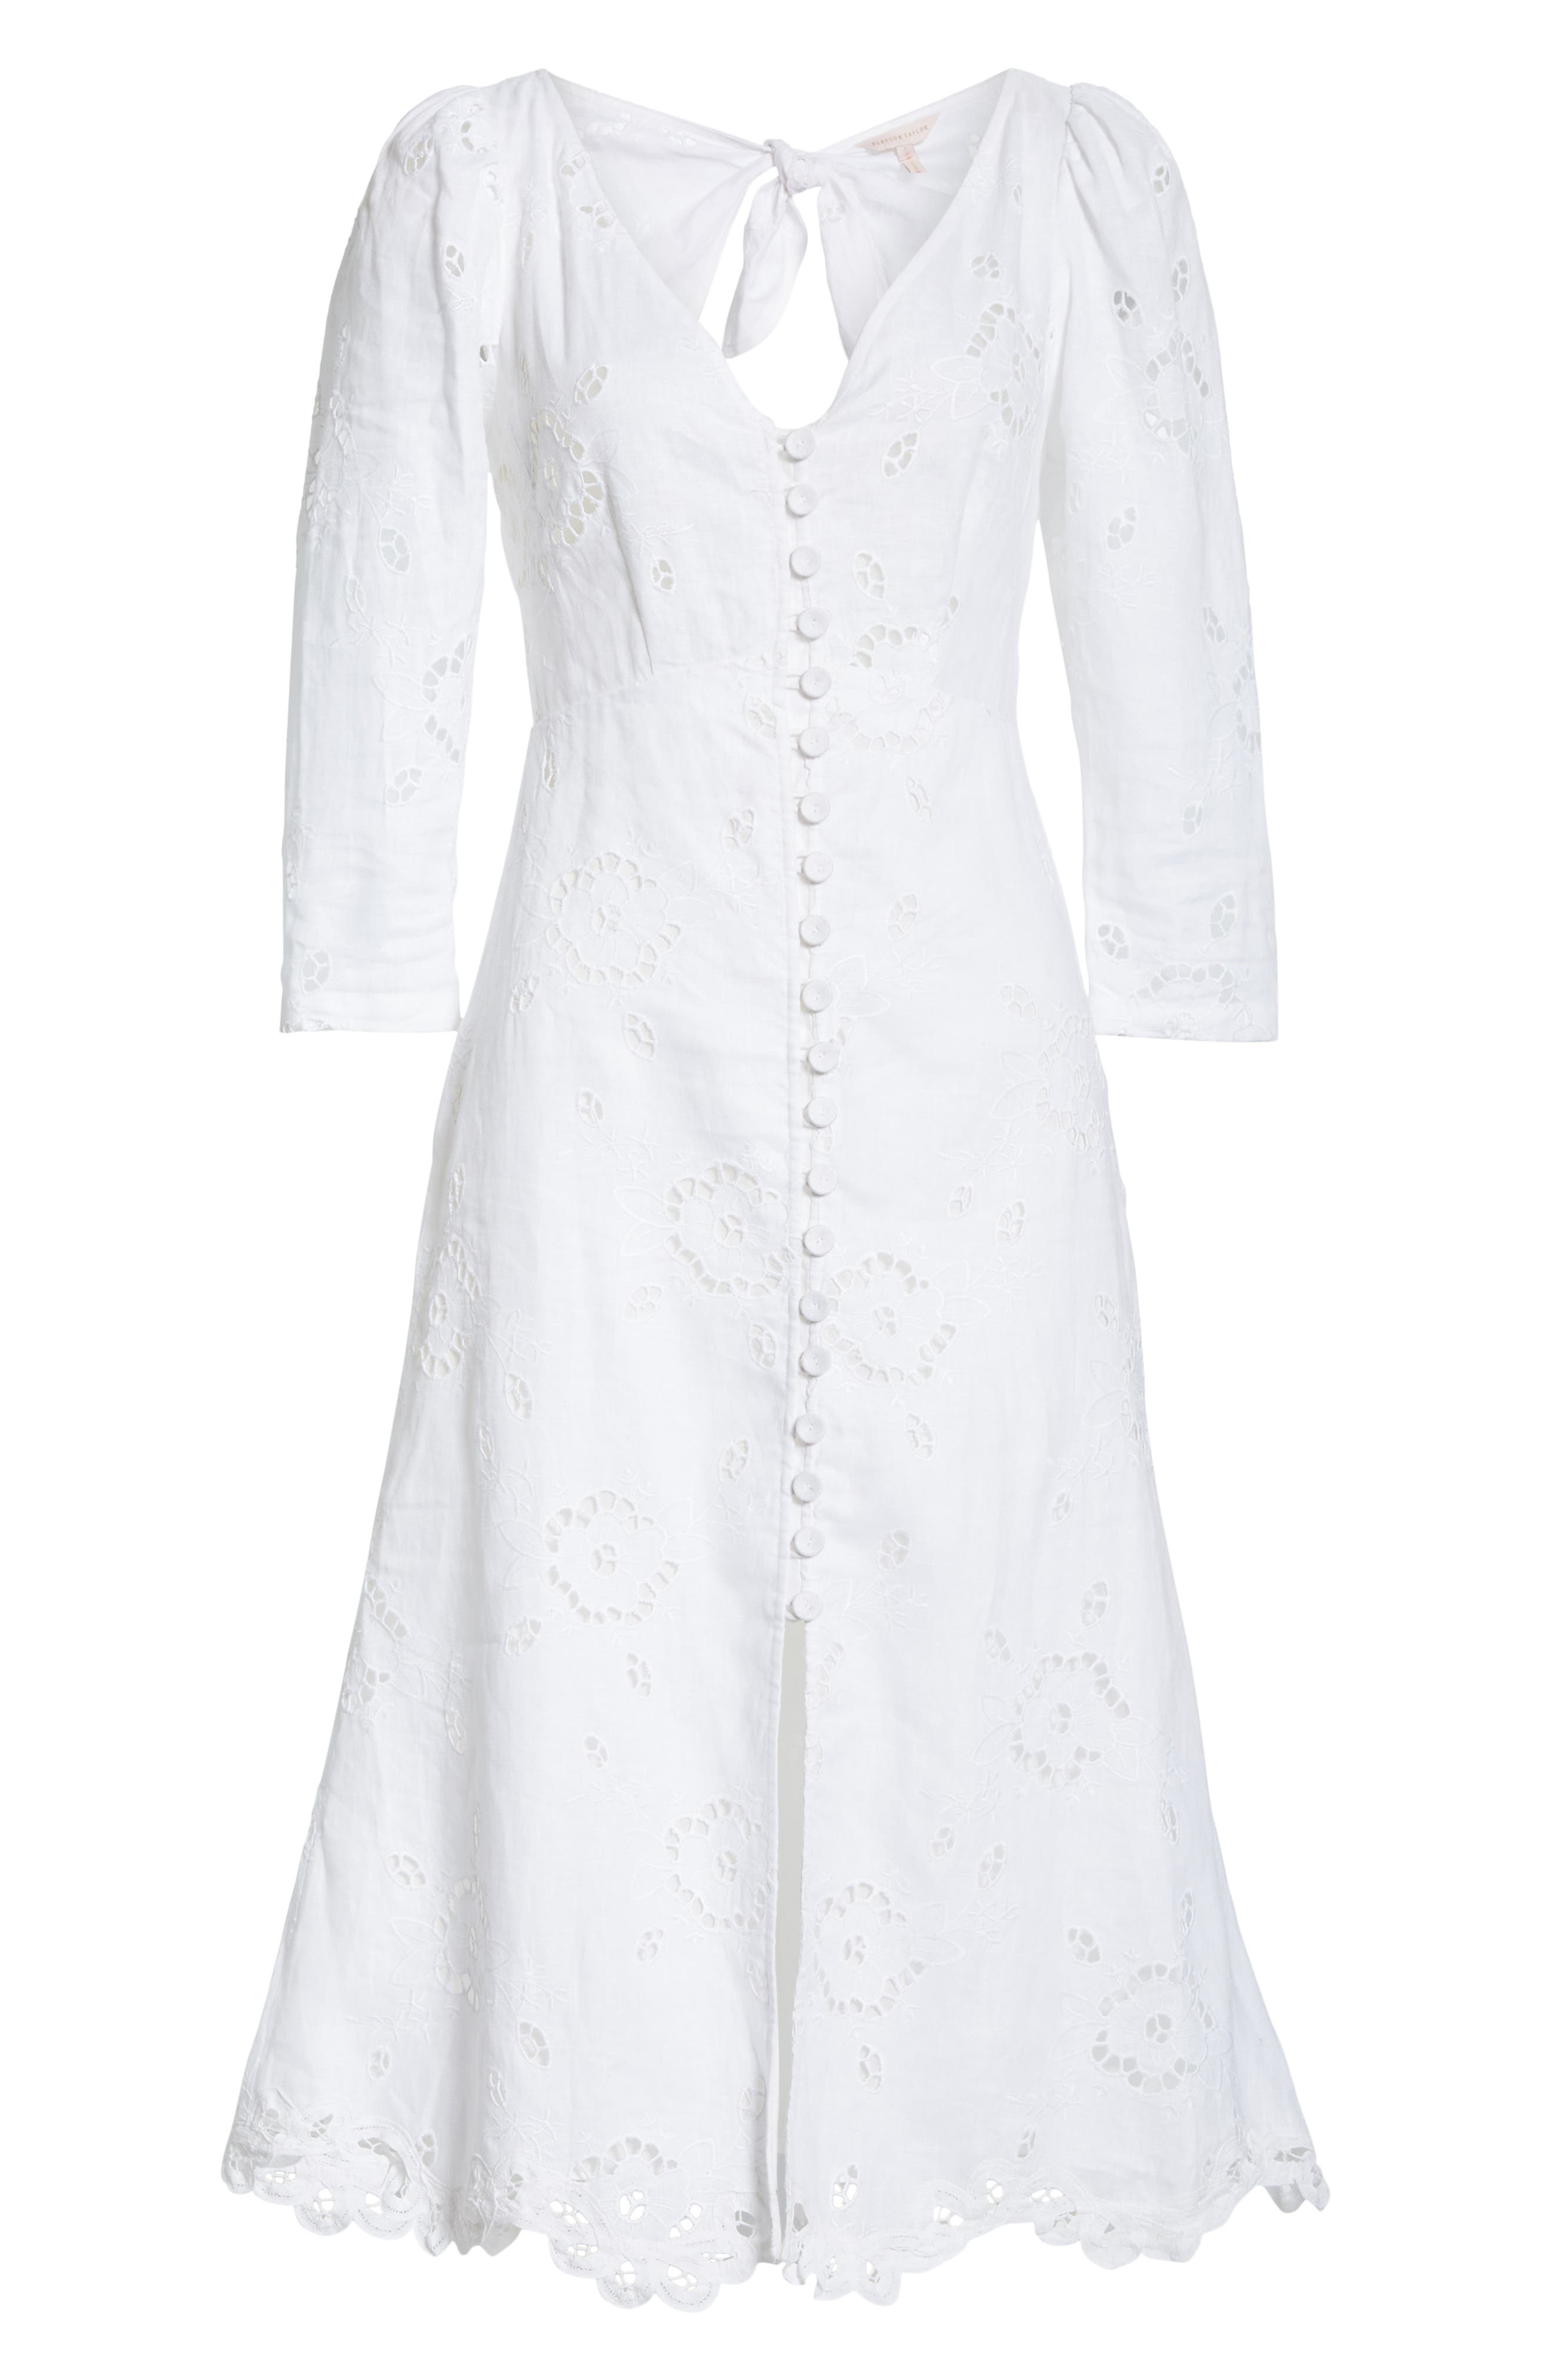 REBECCA TAYLOR, Terri Embroidered A-Line Dress, Alternate thumbnail 7, color, MILK